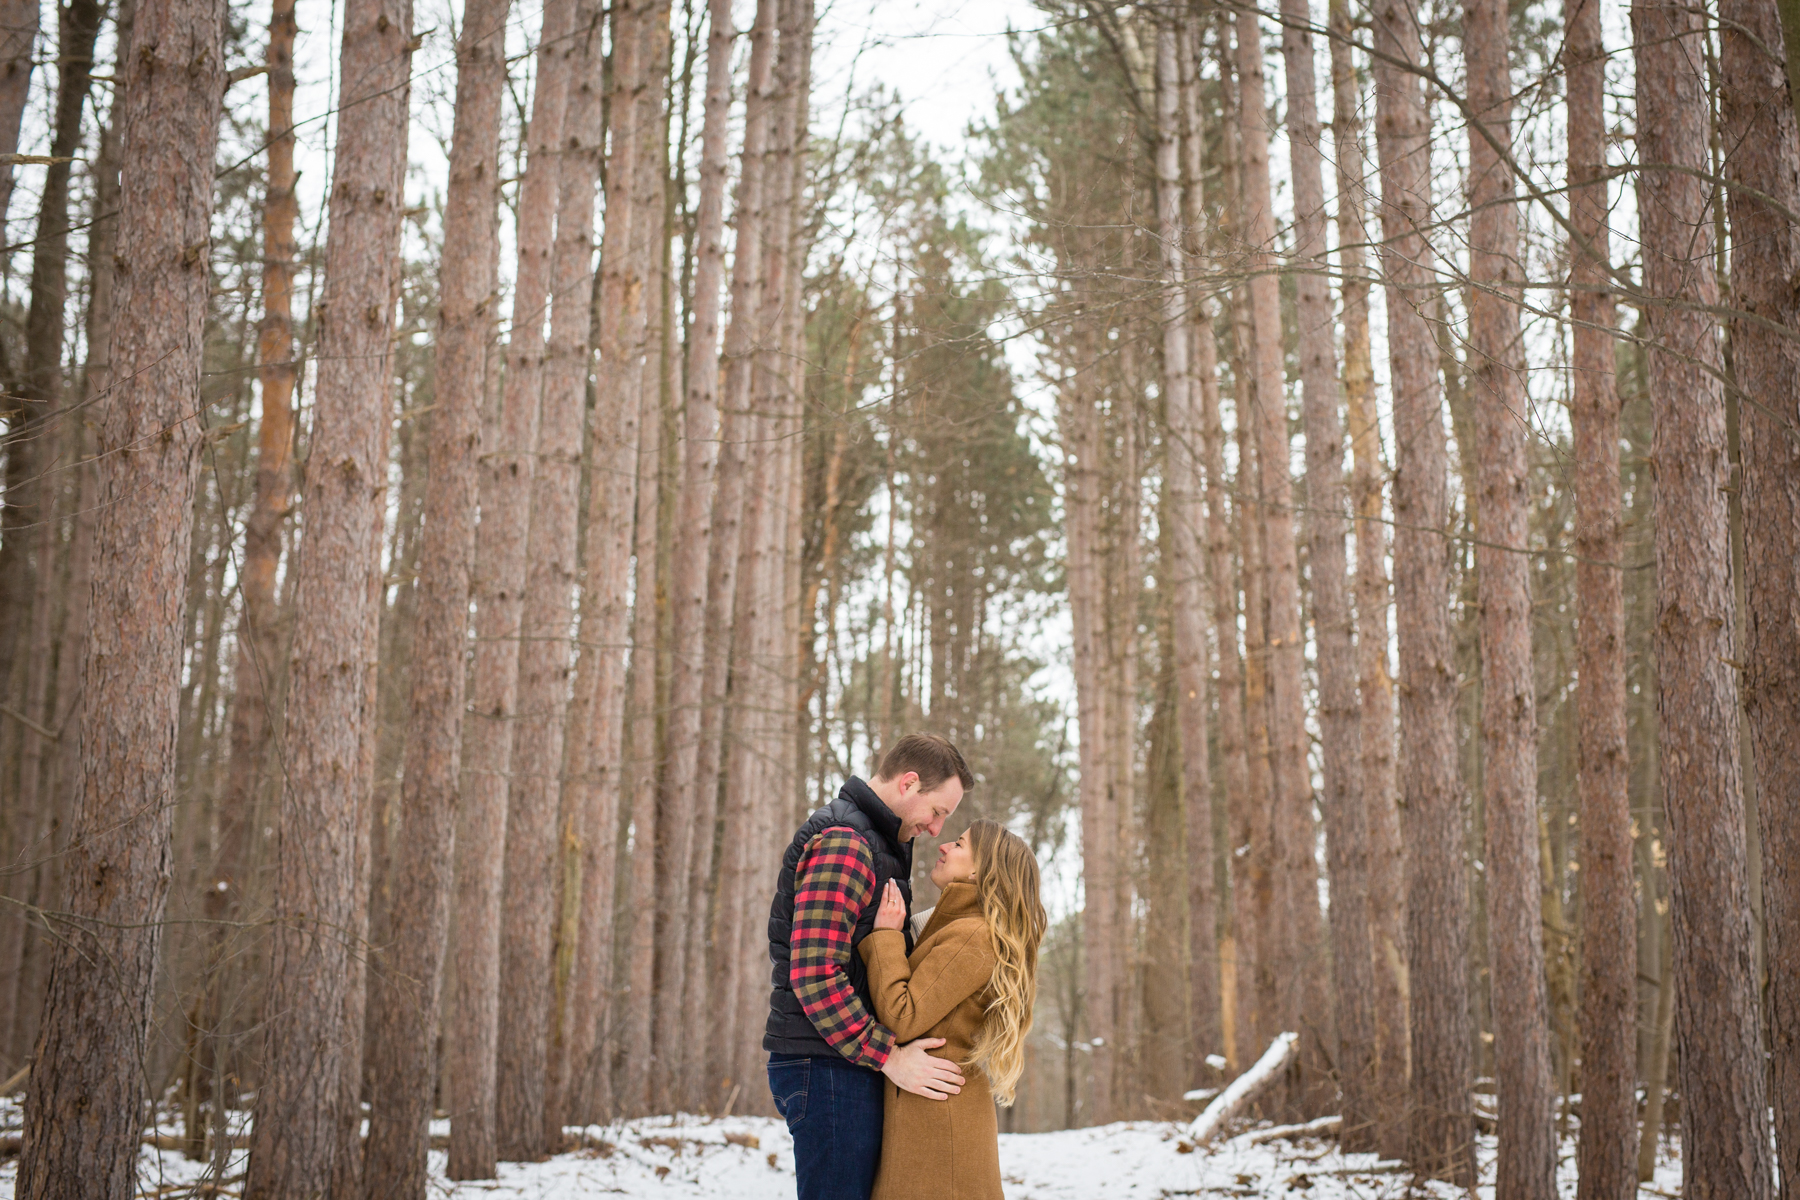 Doug&Kara_winter_Engagment_Photos_Brandon_Shafer_Photography_Blog-26.jpg